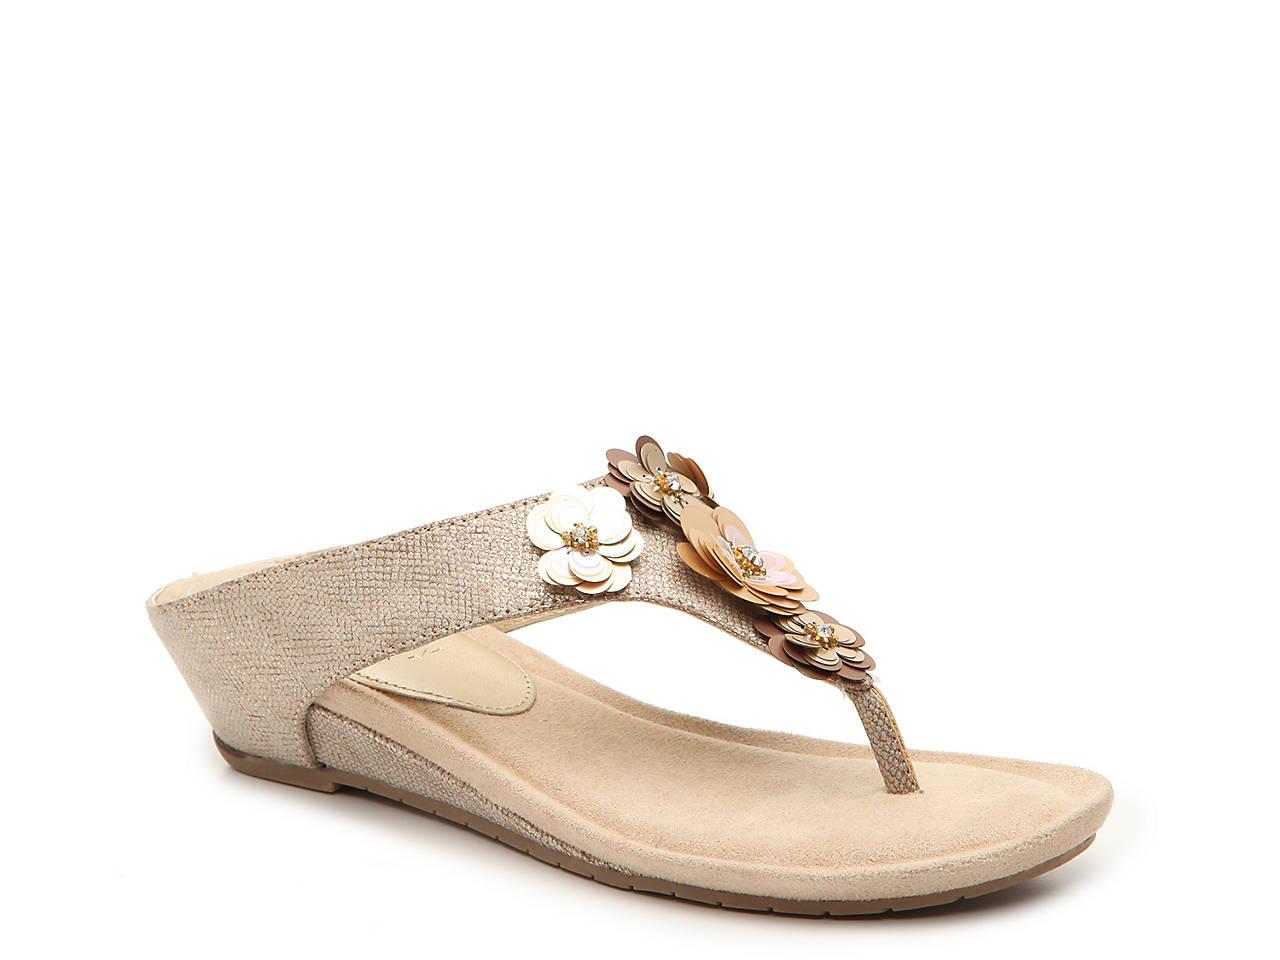 1998548d1199 Kenneth Cole Reaction Great Hop Wedge Sandal Men s Shoes